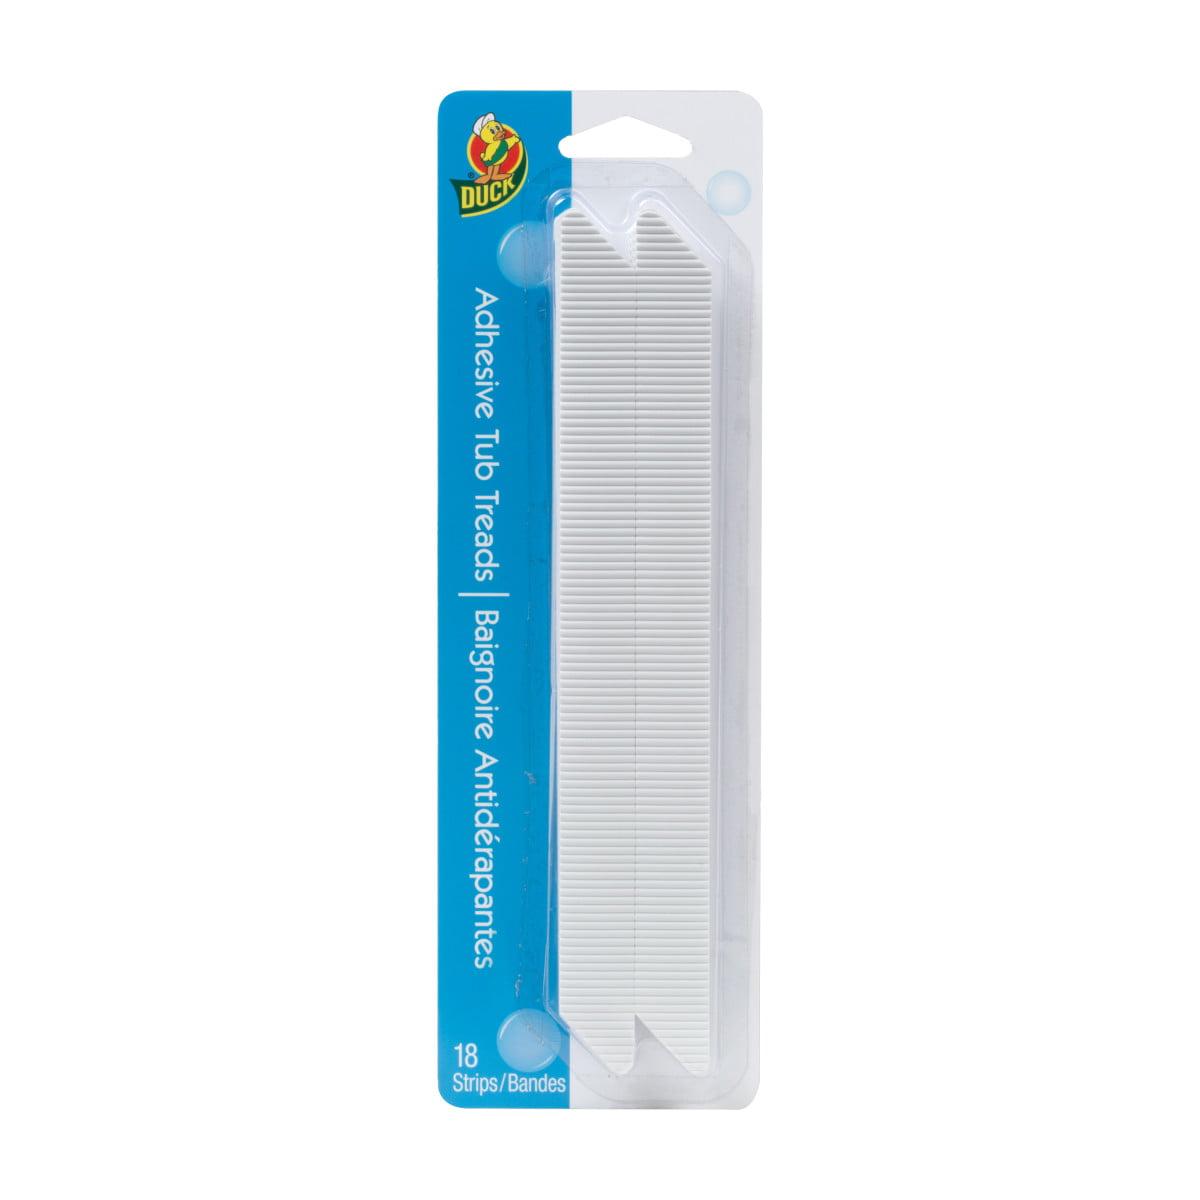 Duck  White  Shower and Bath Treads  Polyurethane  8.75 in L H x 8.75 in